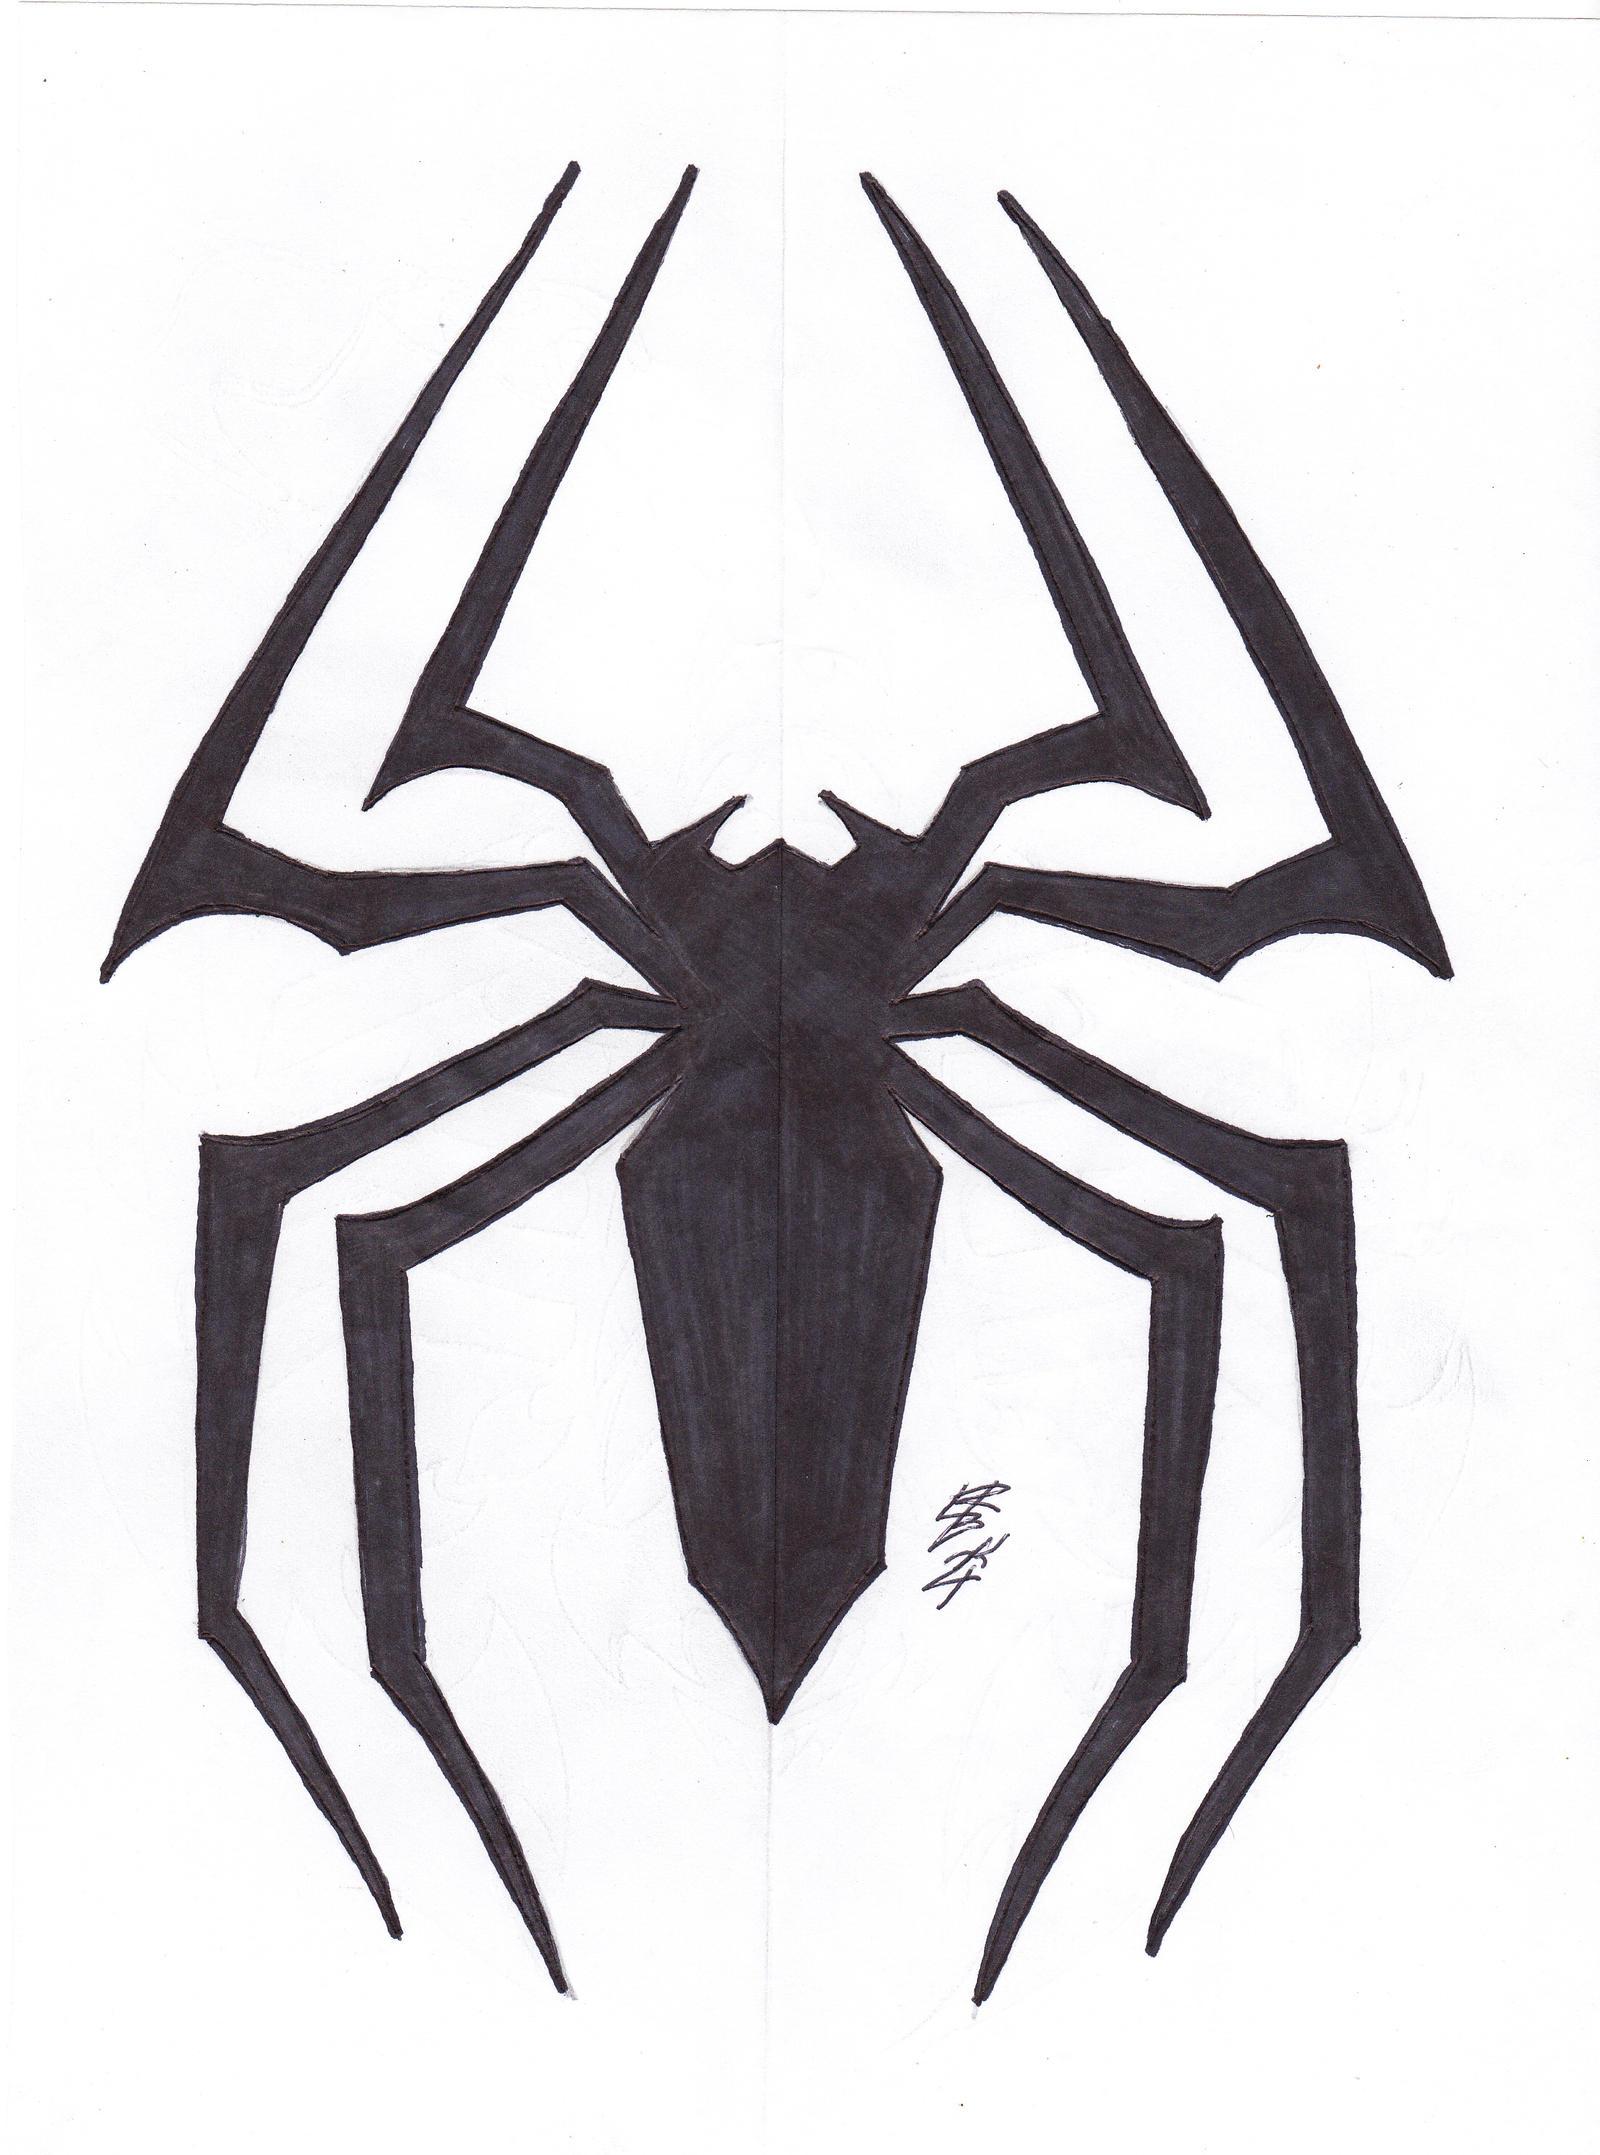 SPIDER-MAN SPIDER SYMBOL by lrayjus21 on DeviantArt